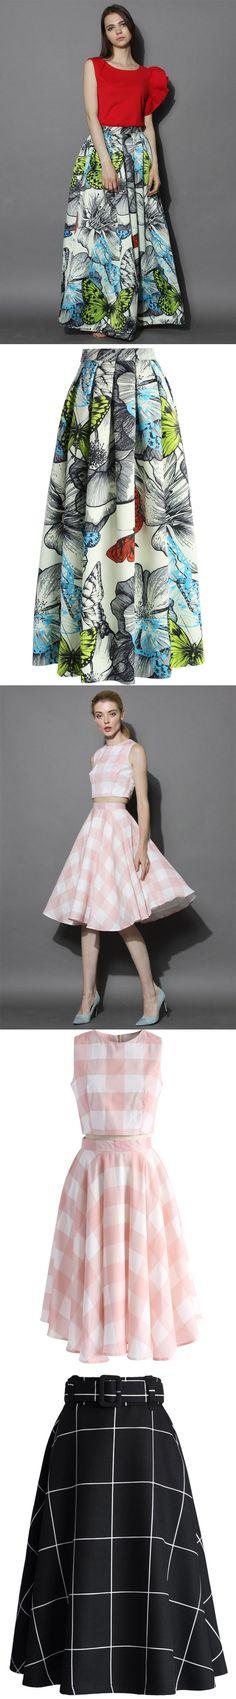 butterfly print skirt, check print skirt